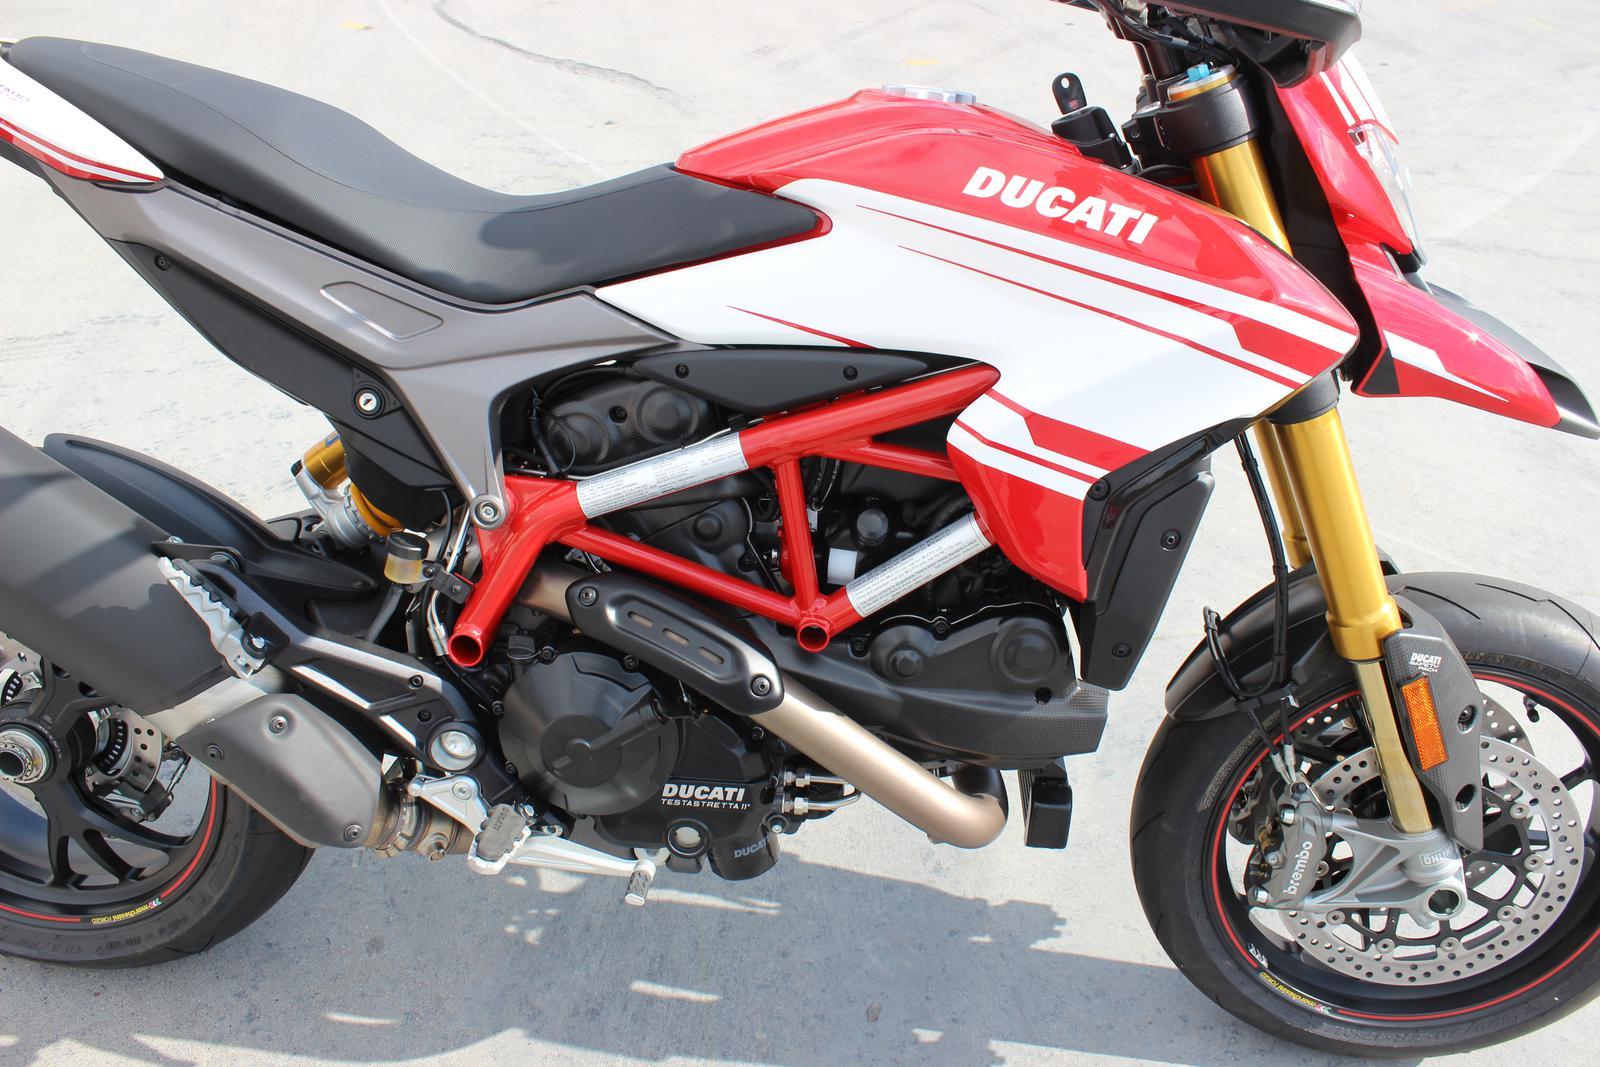 2018 Ducati Hypermotard 939 SP (12)